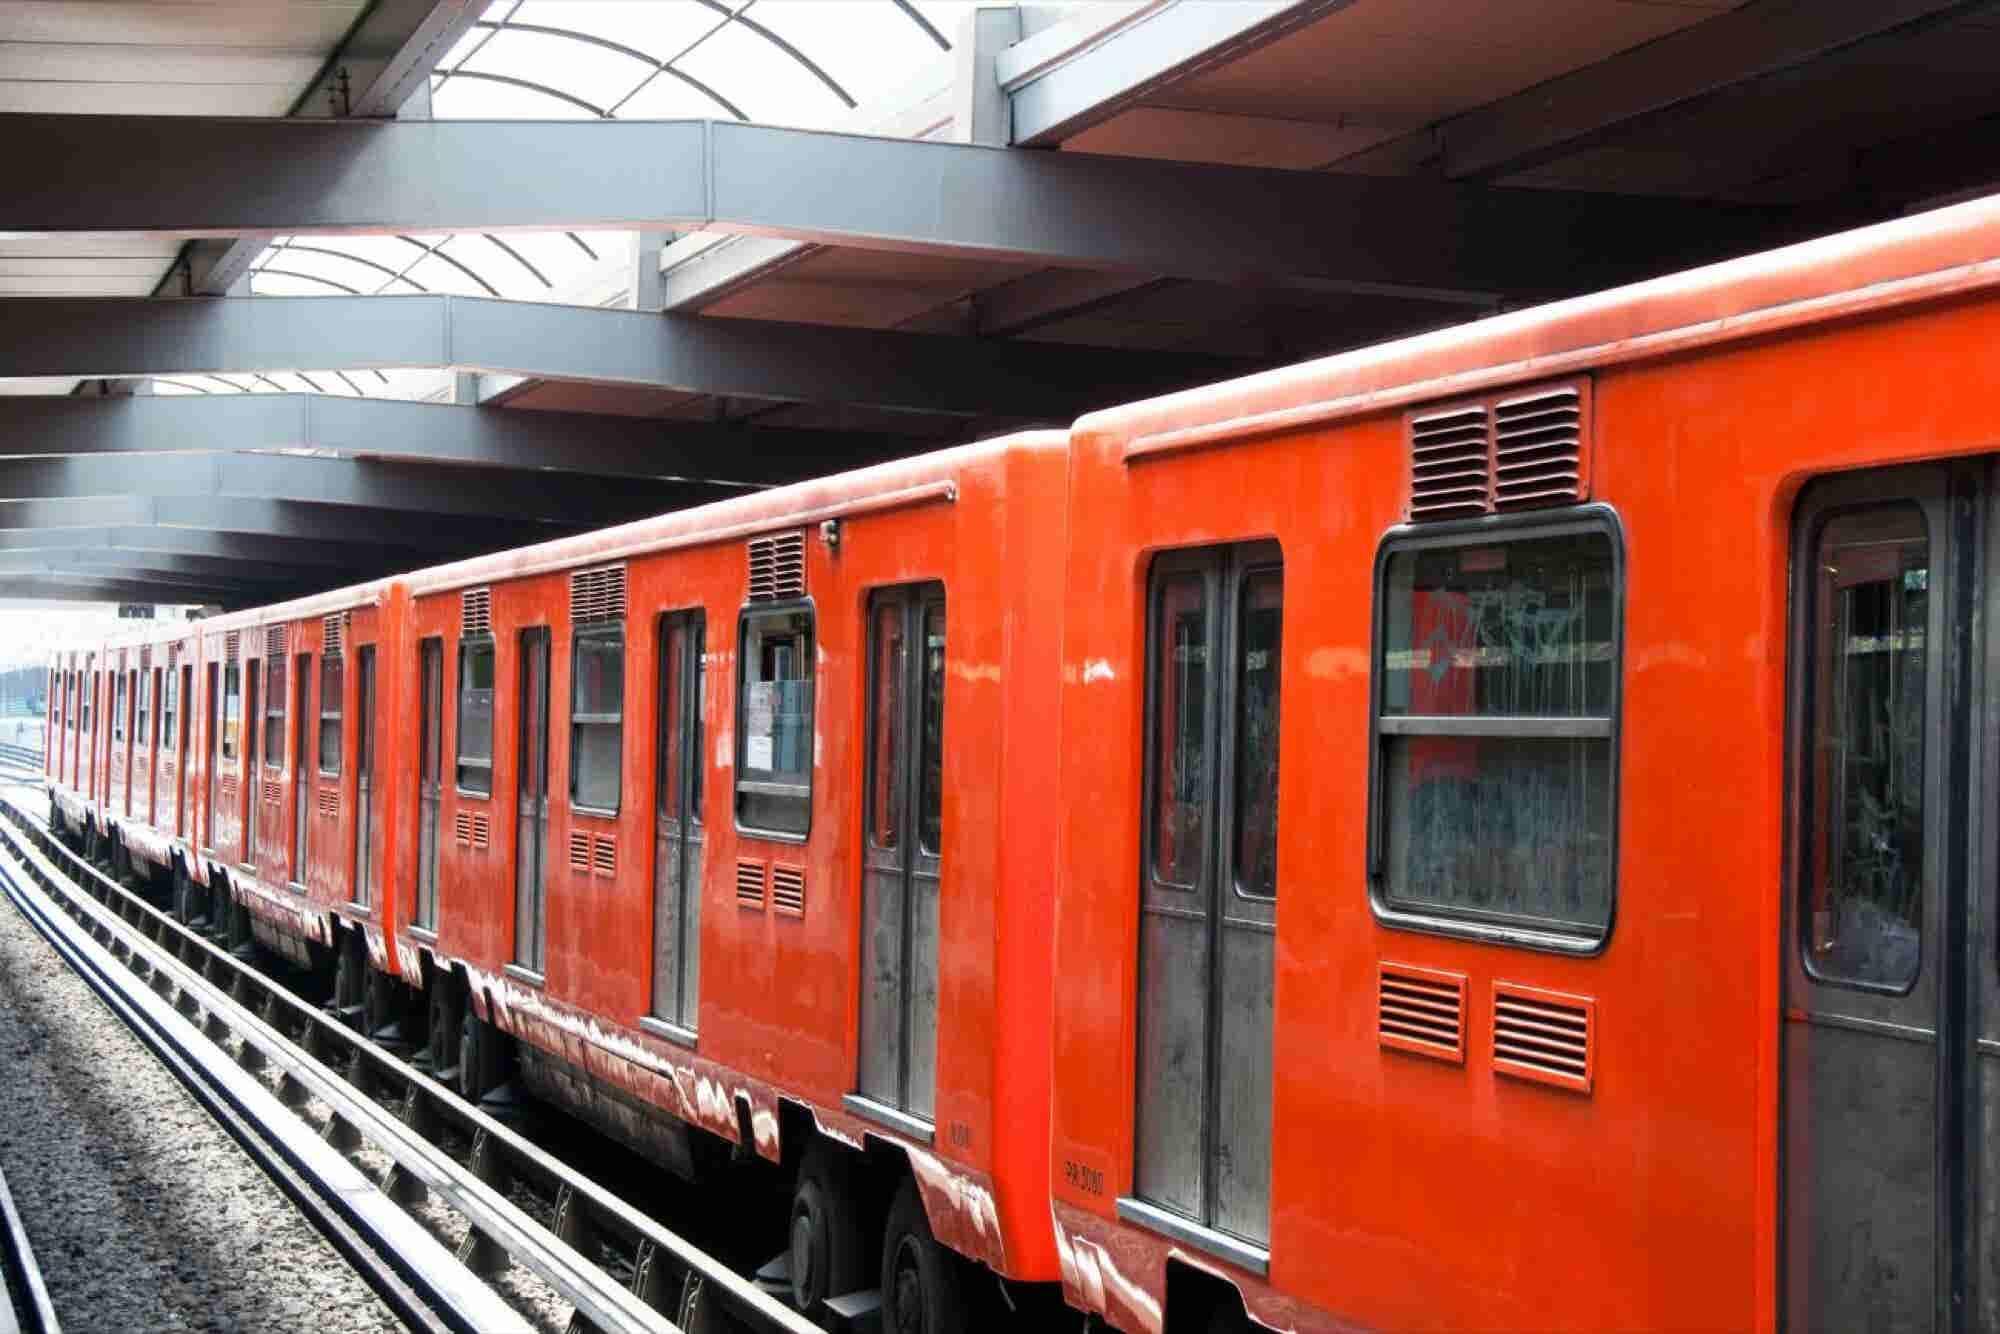 La línea 3 del metro de la CDMX ya tiene Wi-Fi gratuito